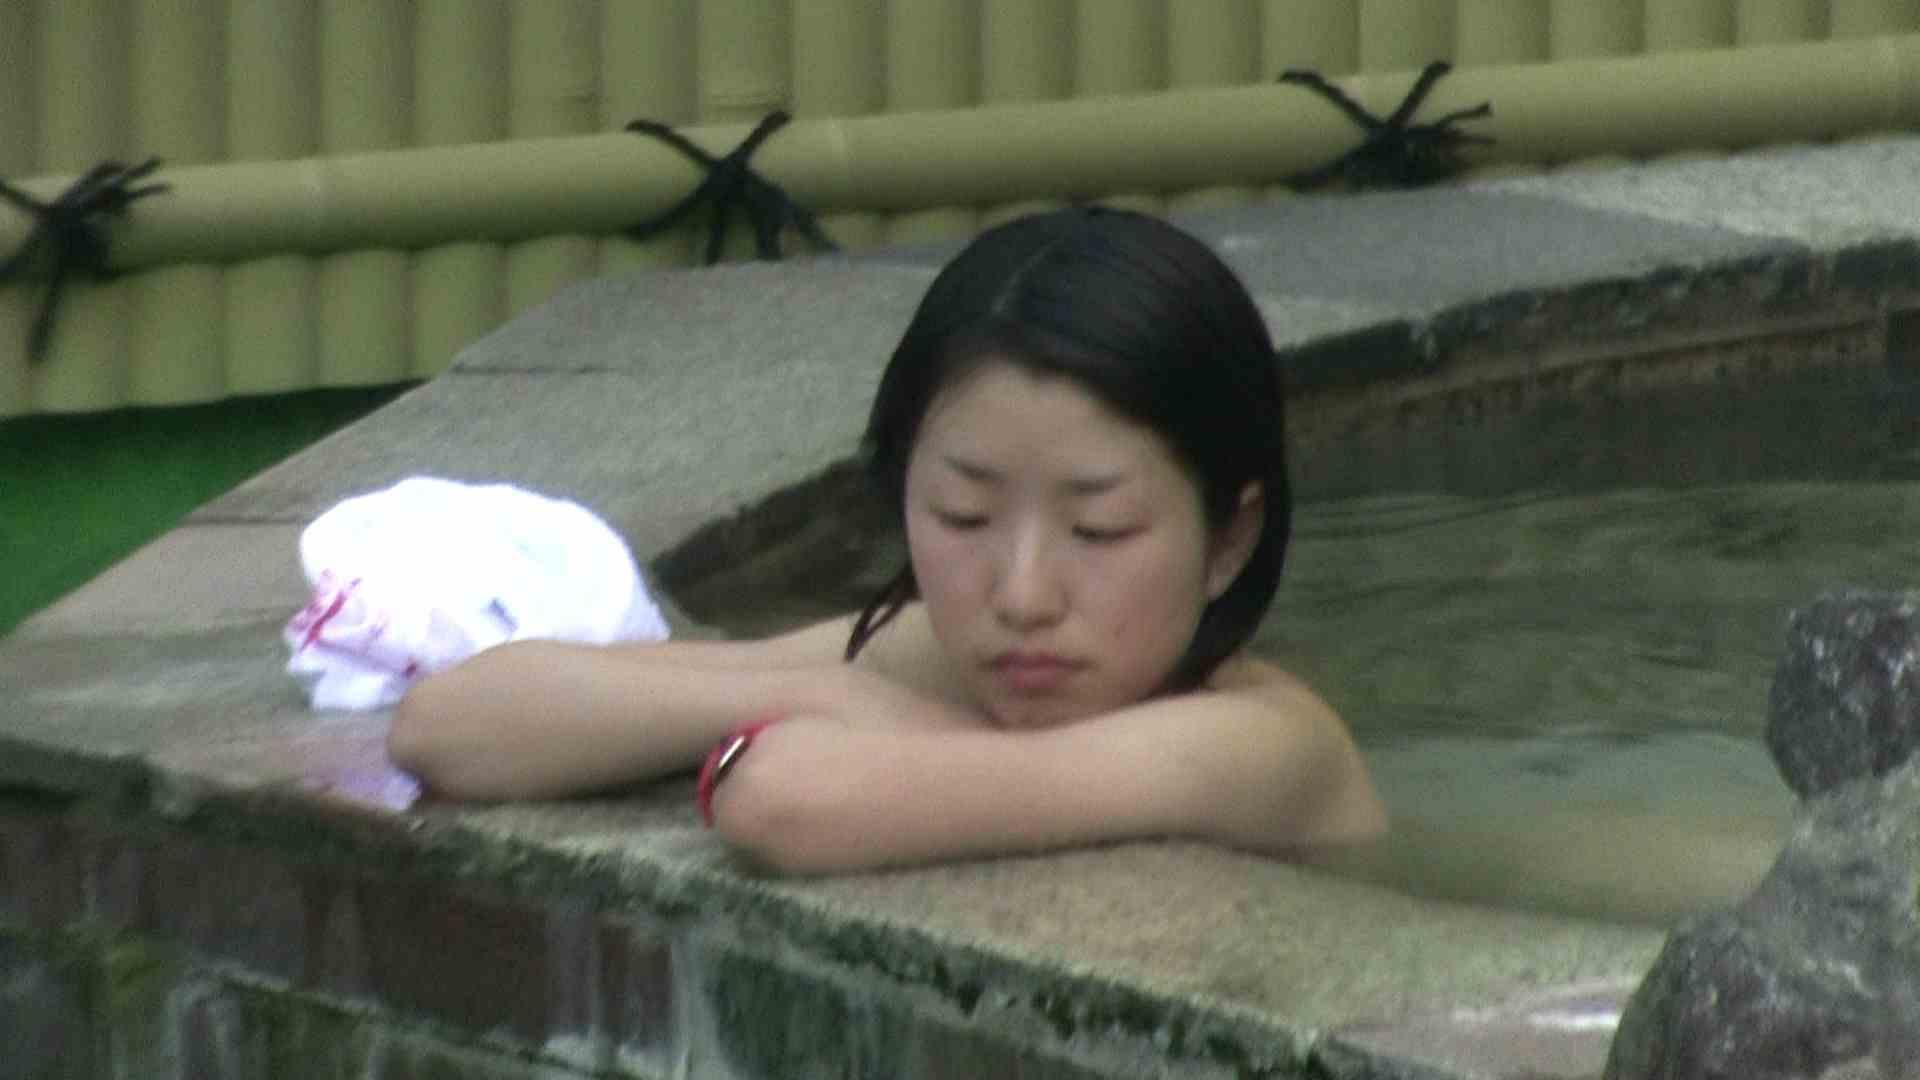 Aquaな露天風呂Vol.133 0 | 0  46連発 1